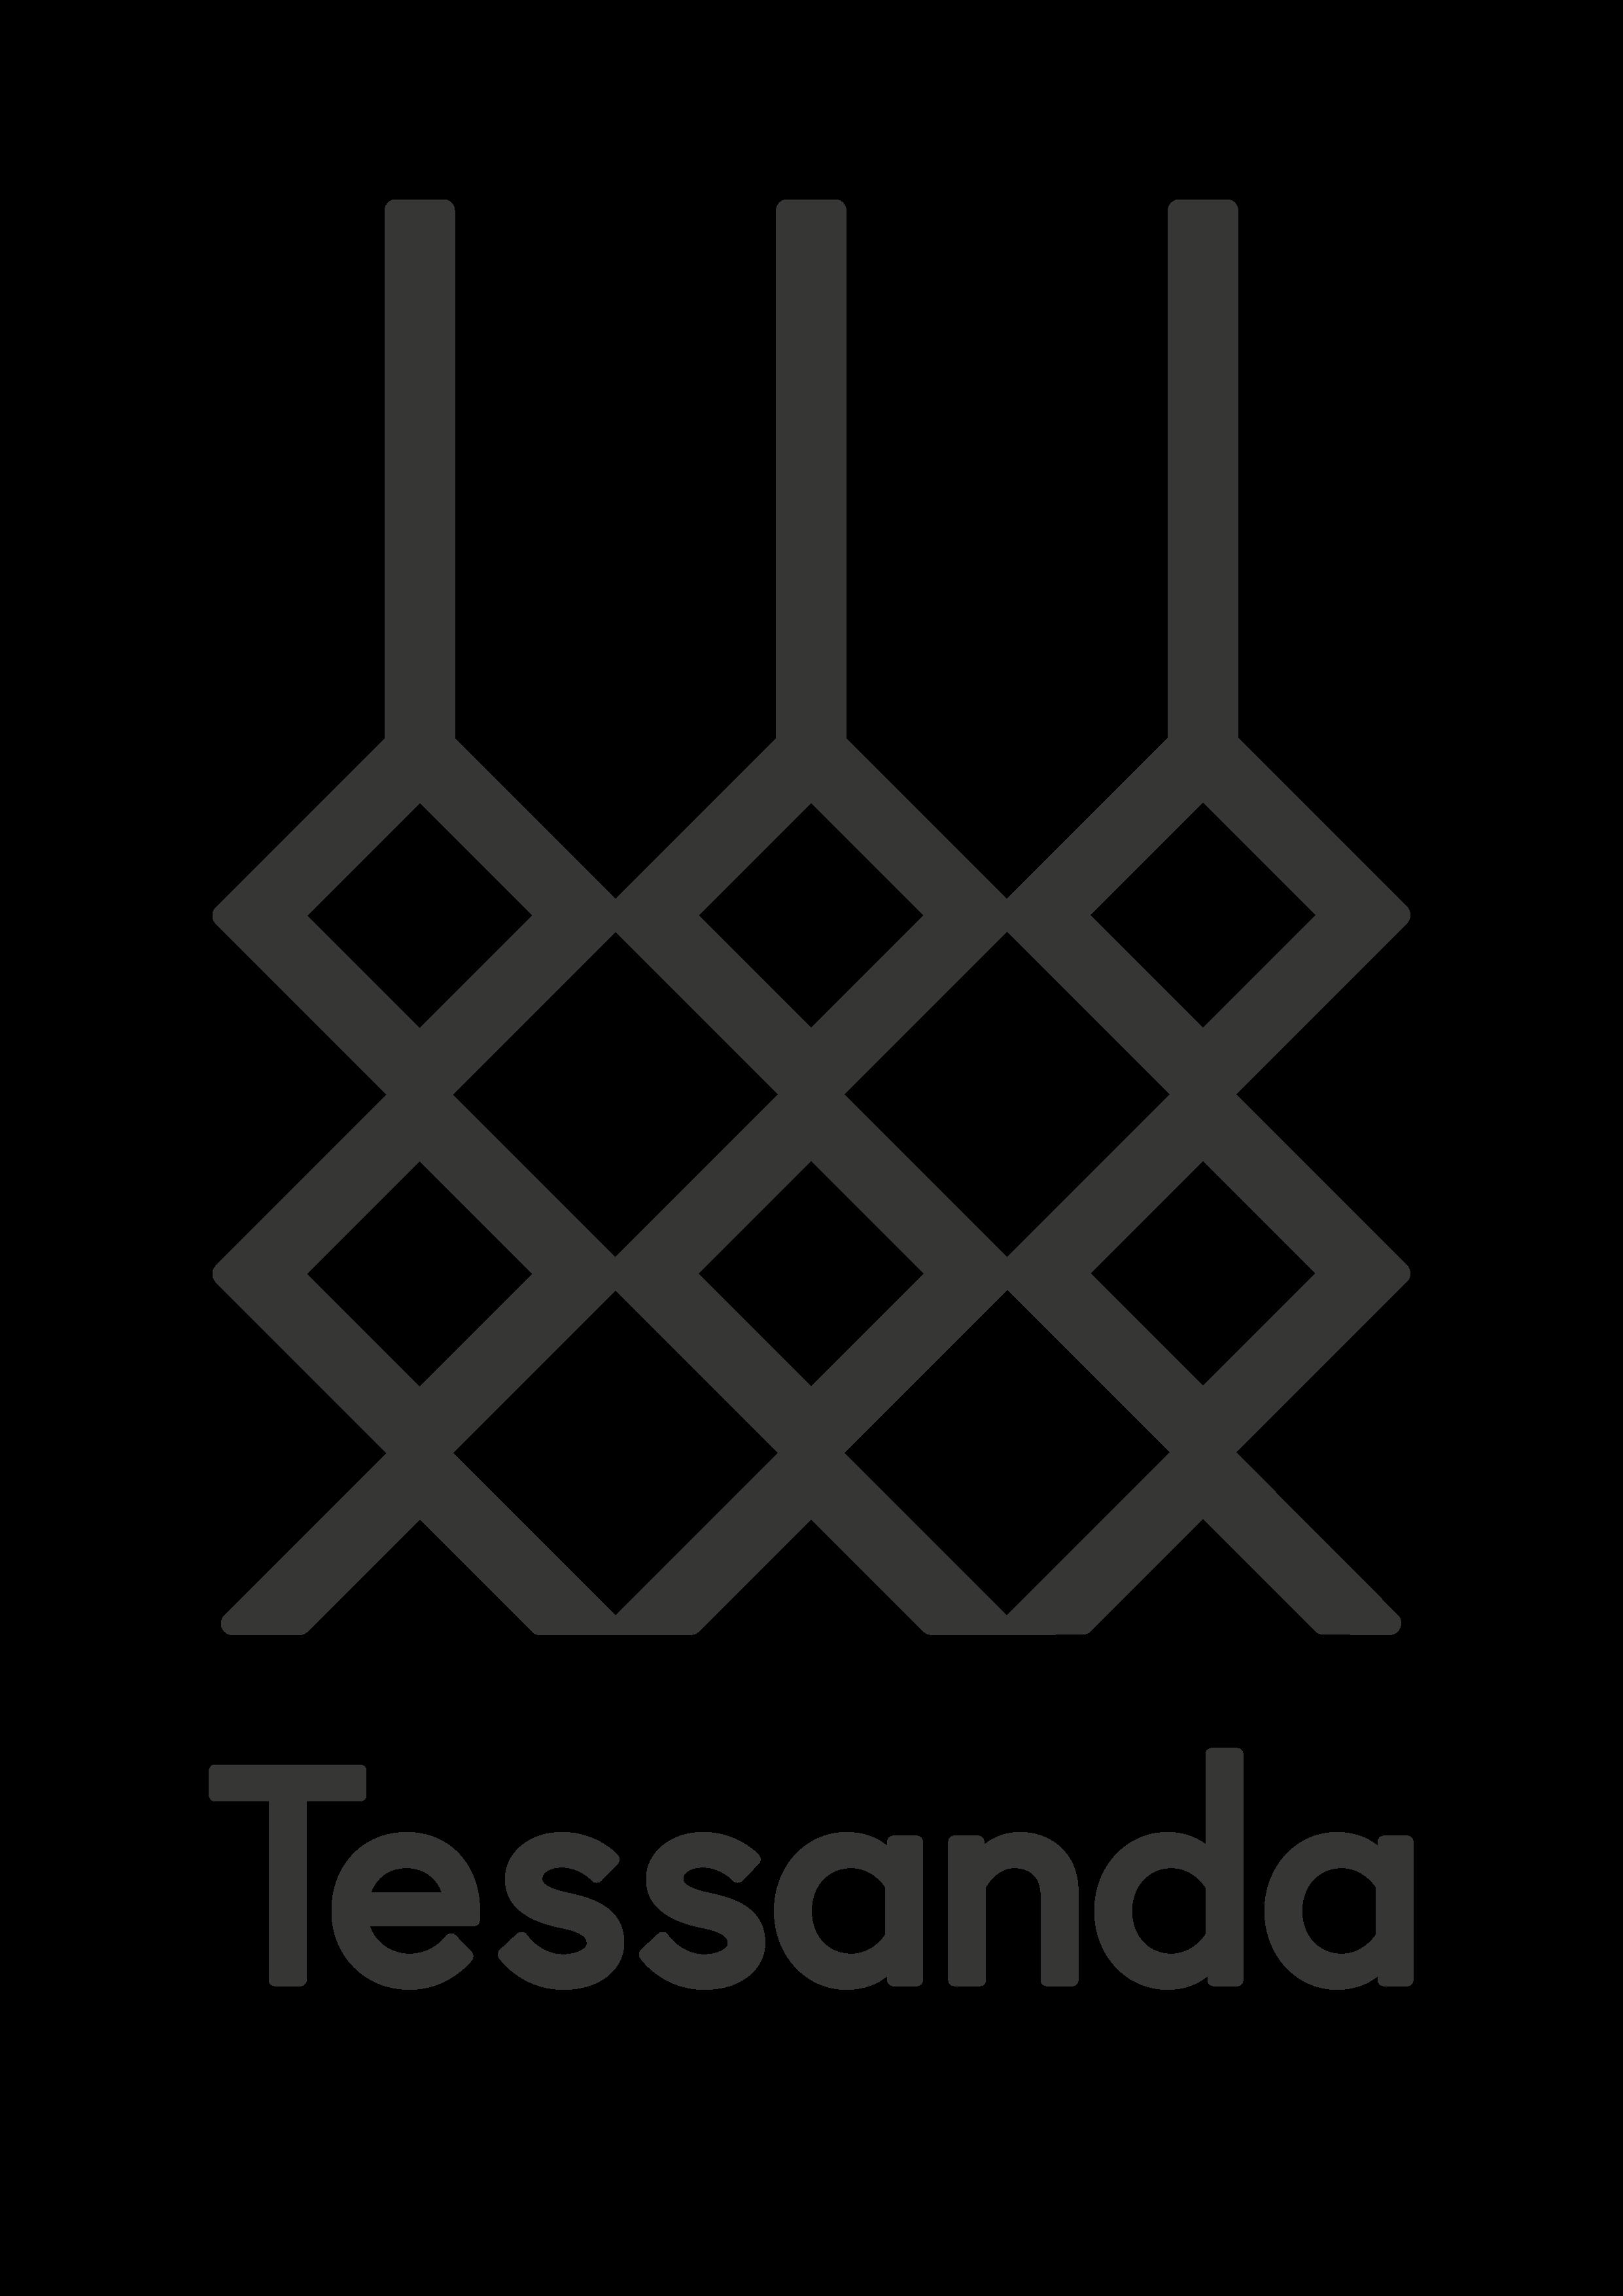 Tessanda Val Müstair